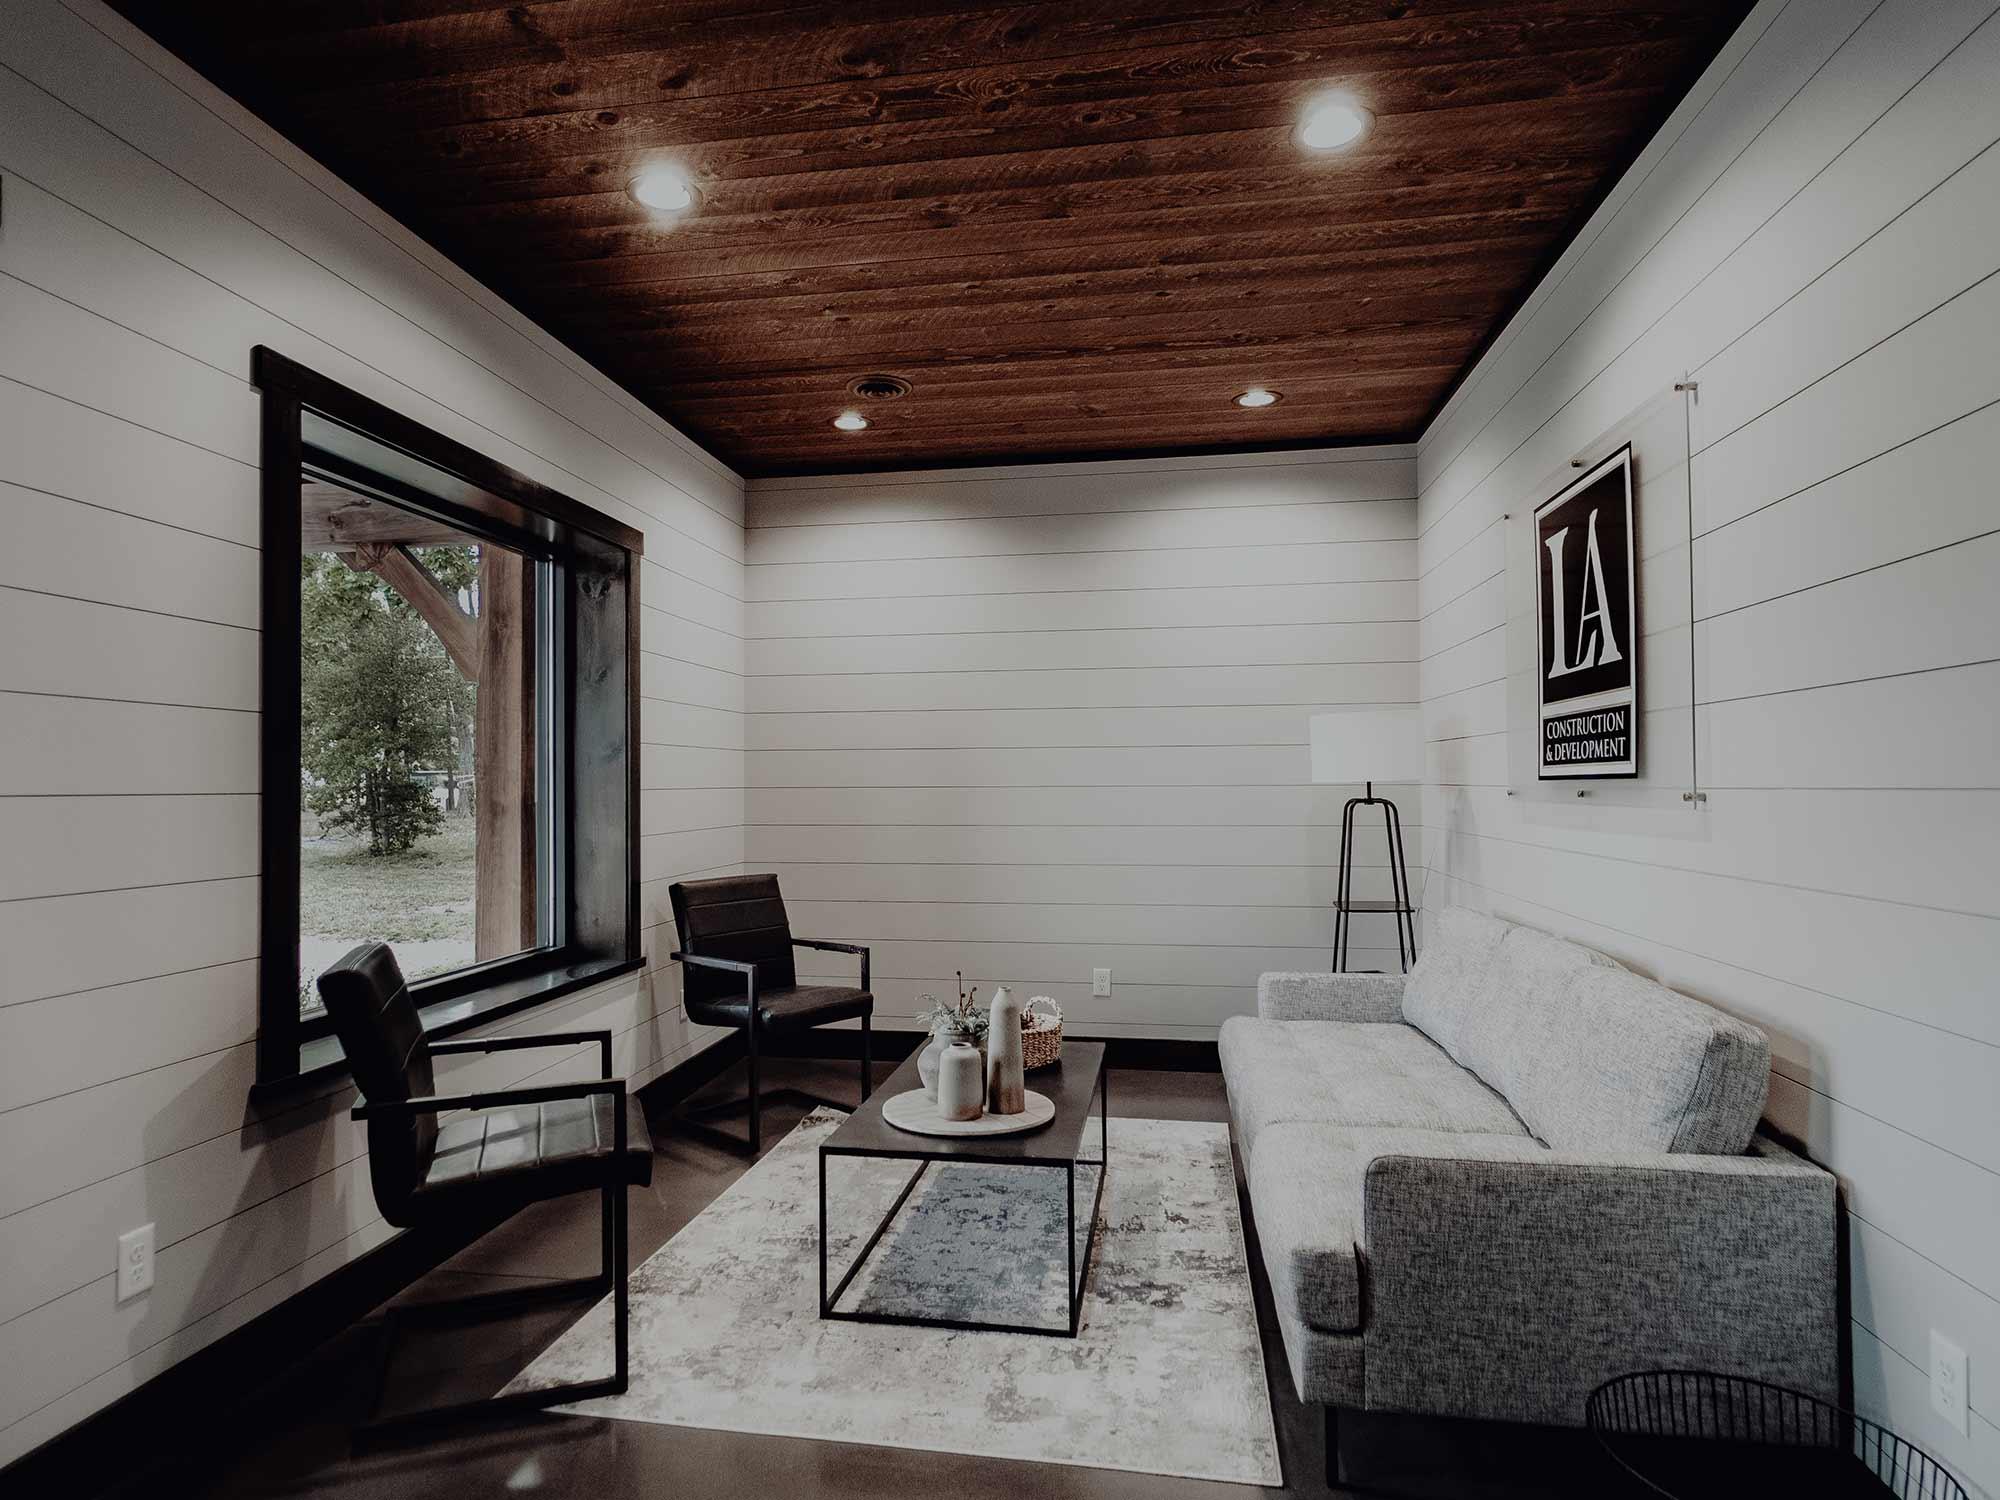 LA Construction office space, an East Tennessee custom home builder serving Cherokee Lake, Dandridge, Jefferson County, Douglas Lake, and Hamblen County.